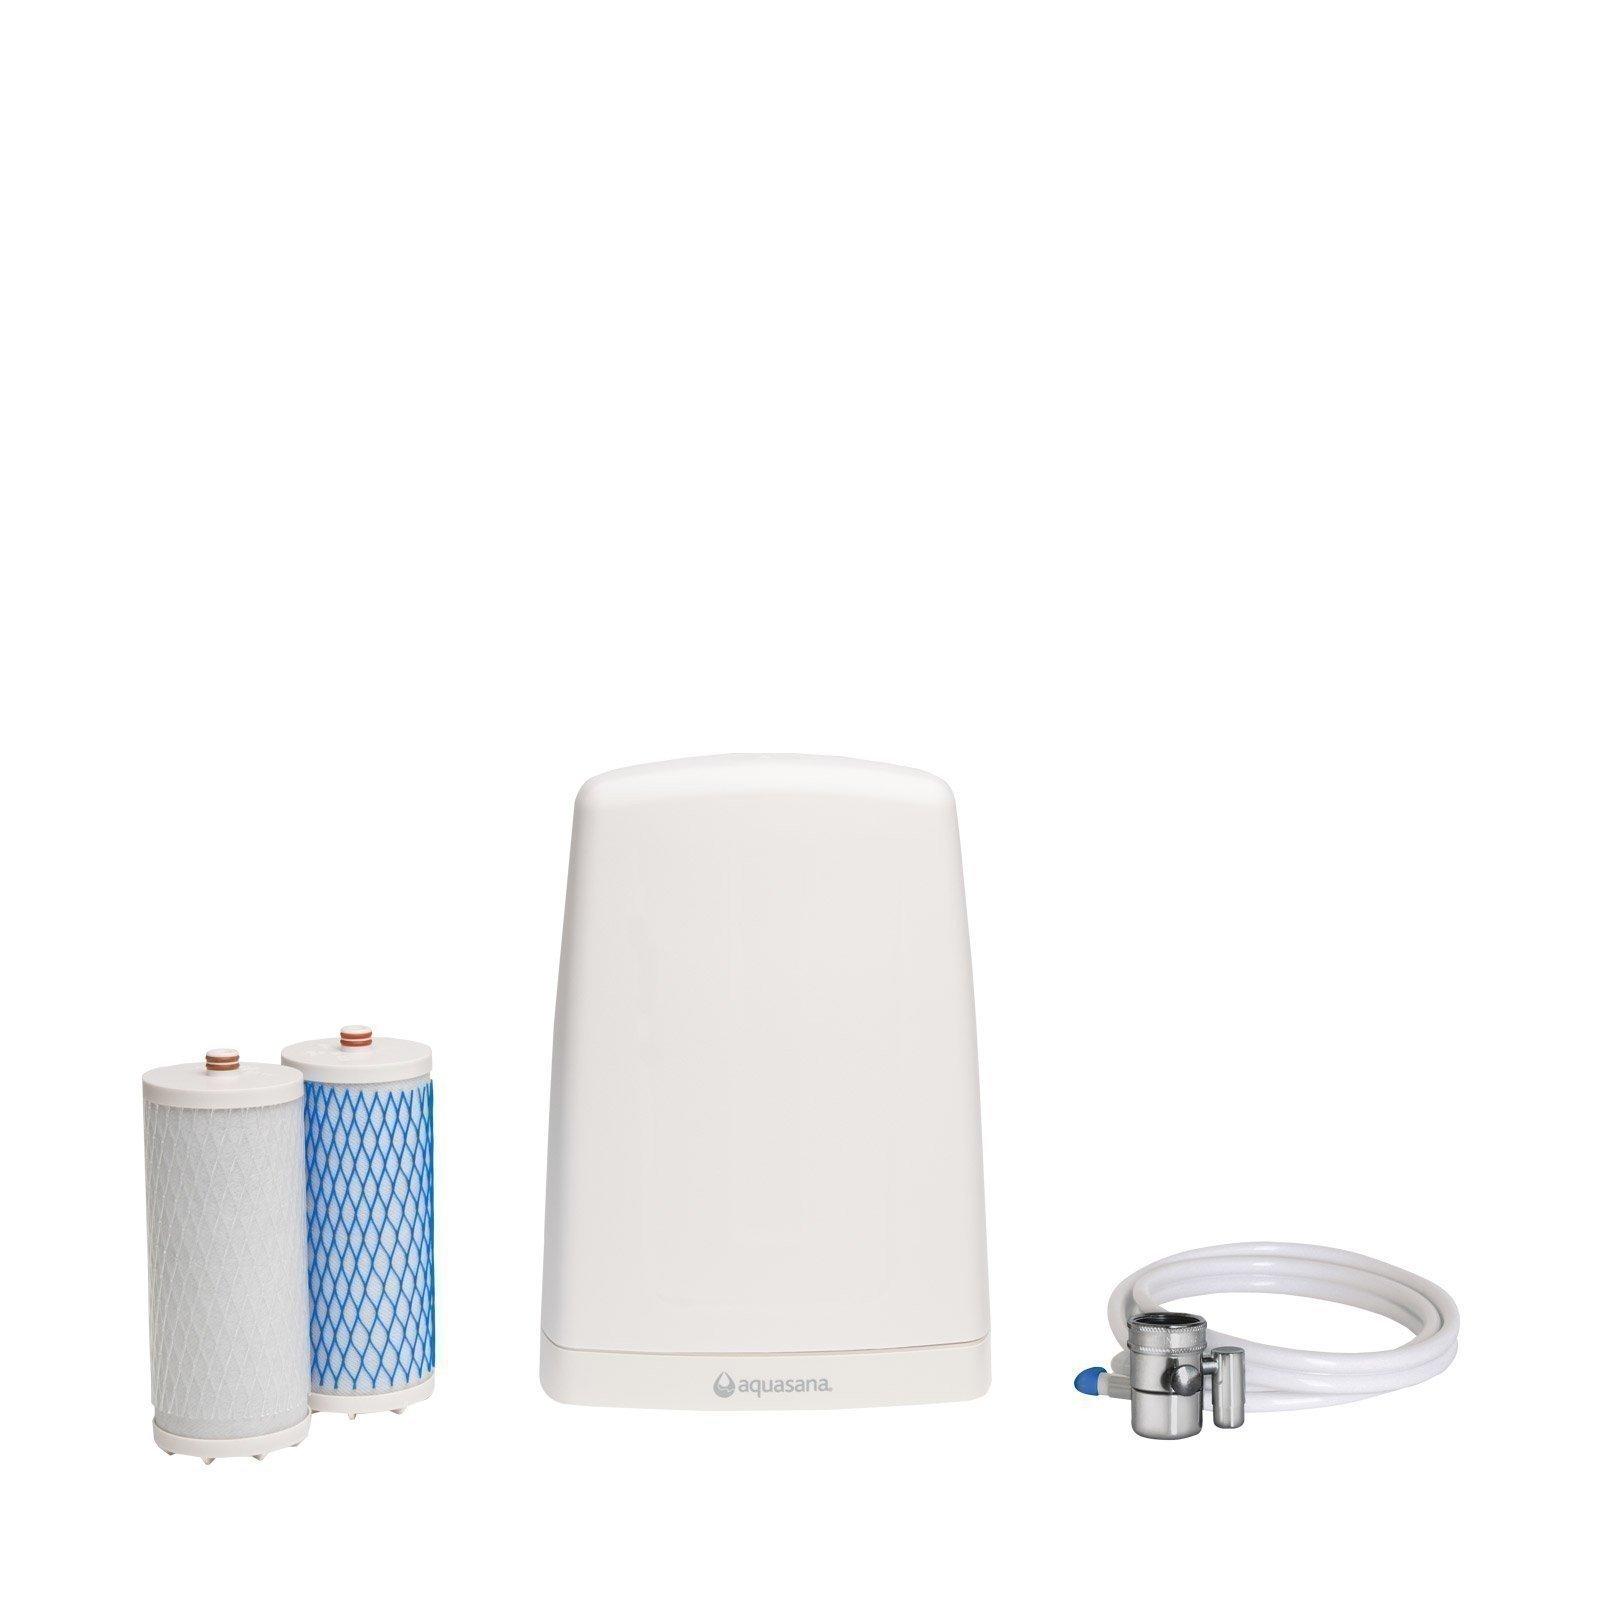 aquasana water filter shower filter combination. Black Bedroom Furniture Sets. Home Design Ideas